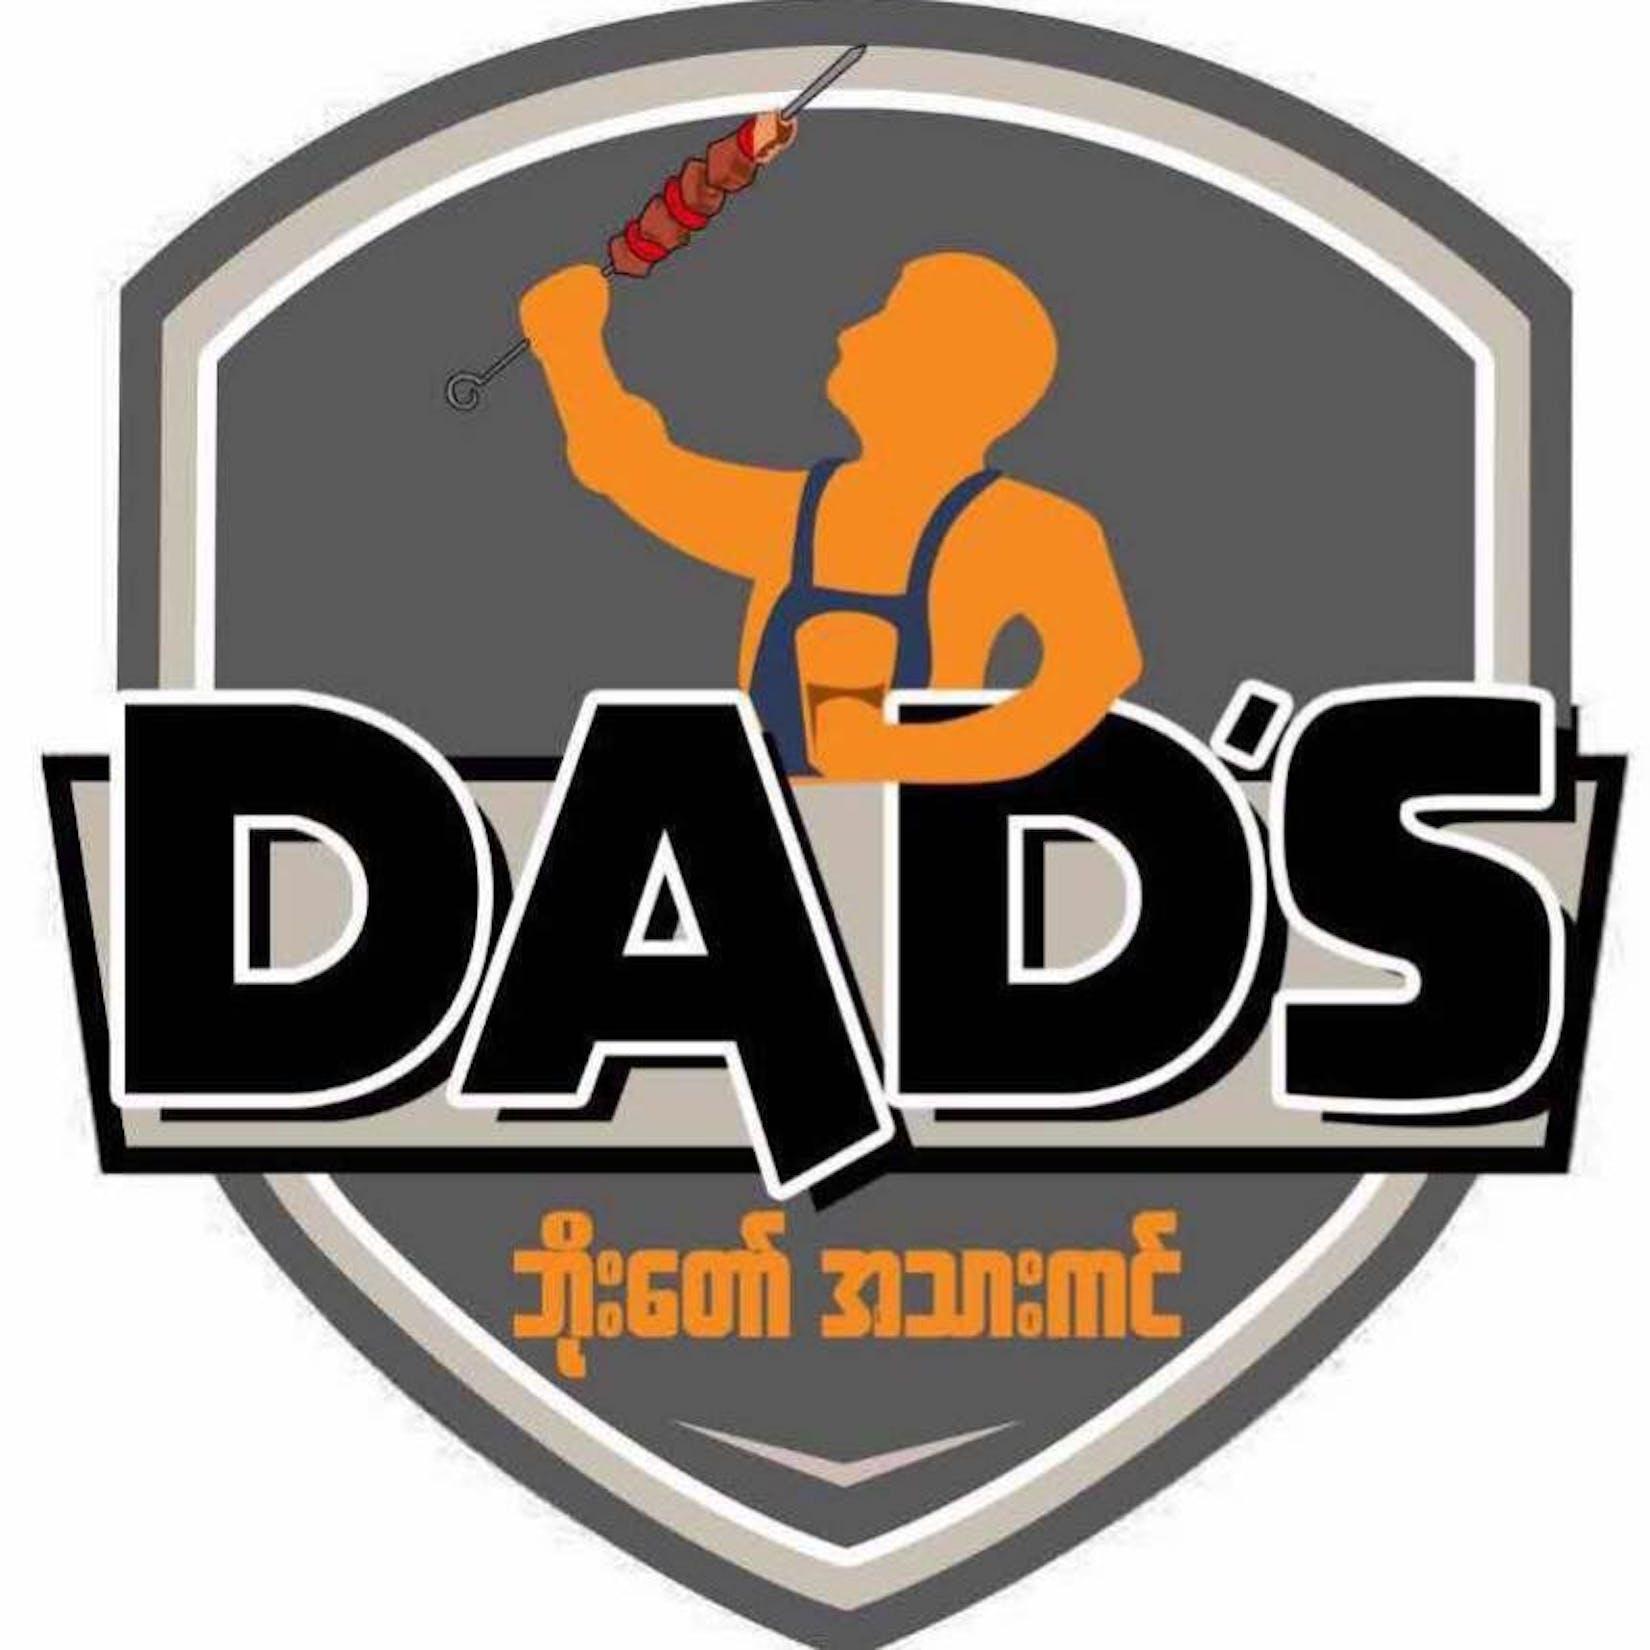 Dad's BBQ - 84 | yathar